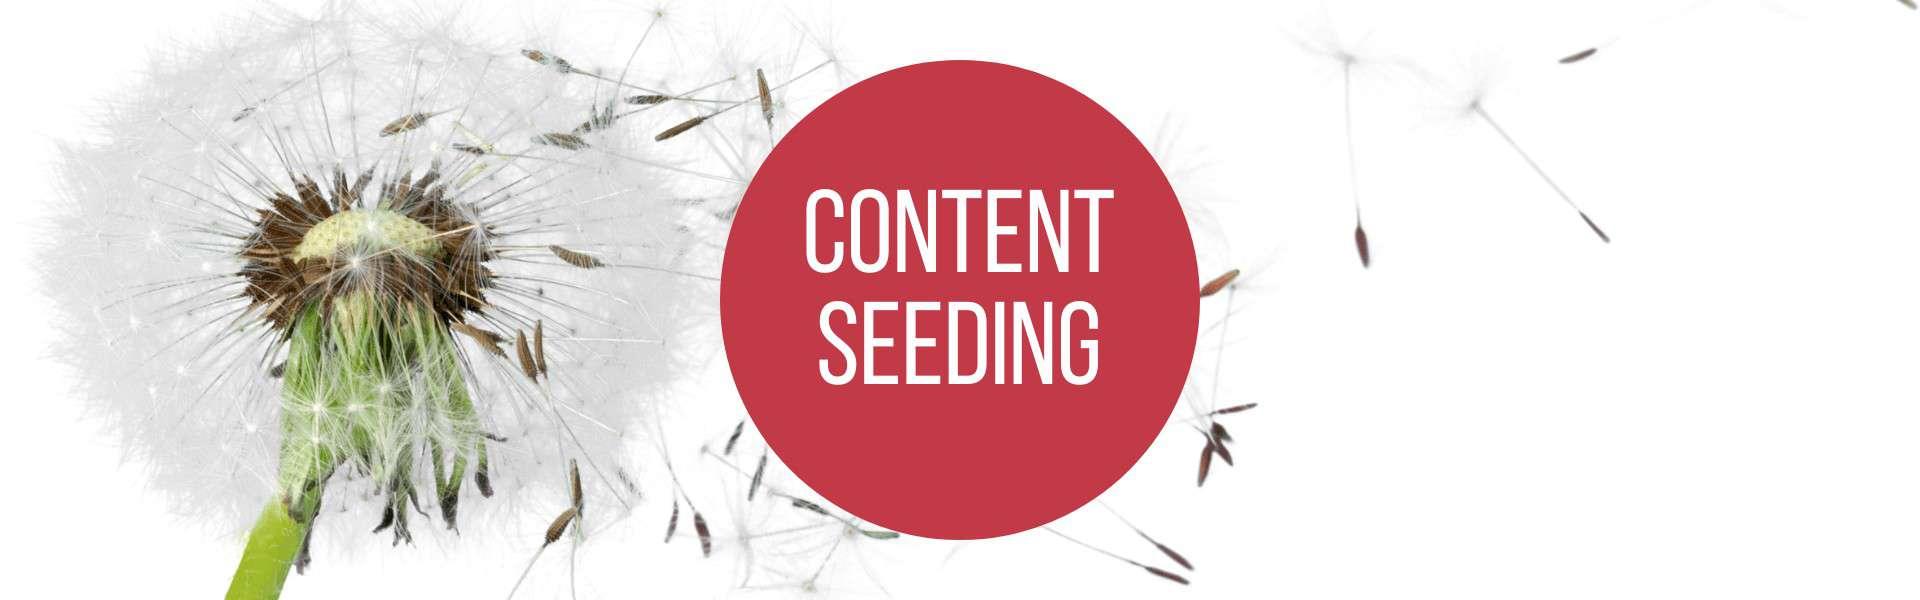 Content Seeding, Content Seeding – so wird's gemacht!